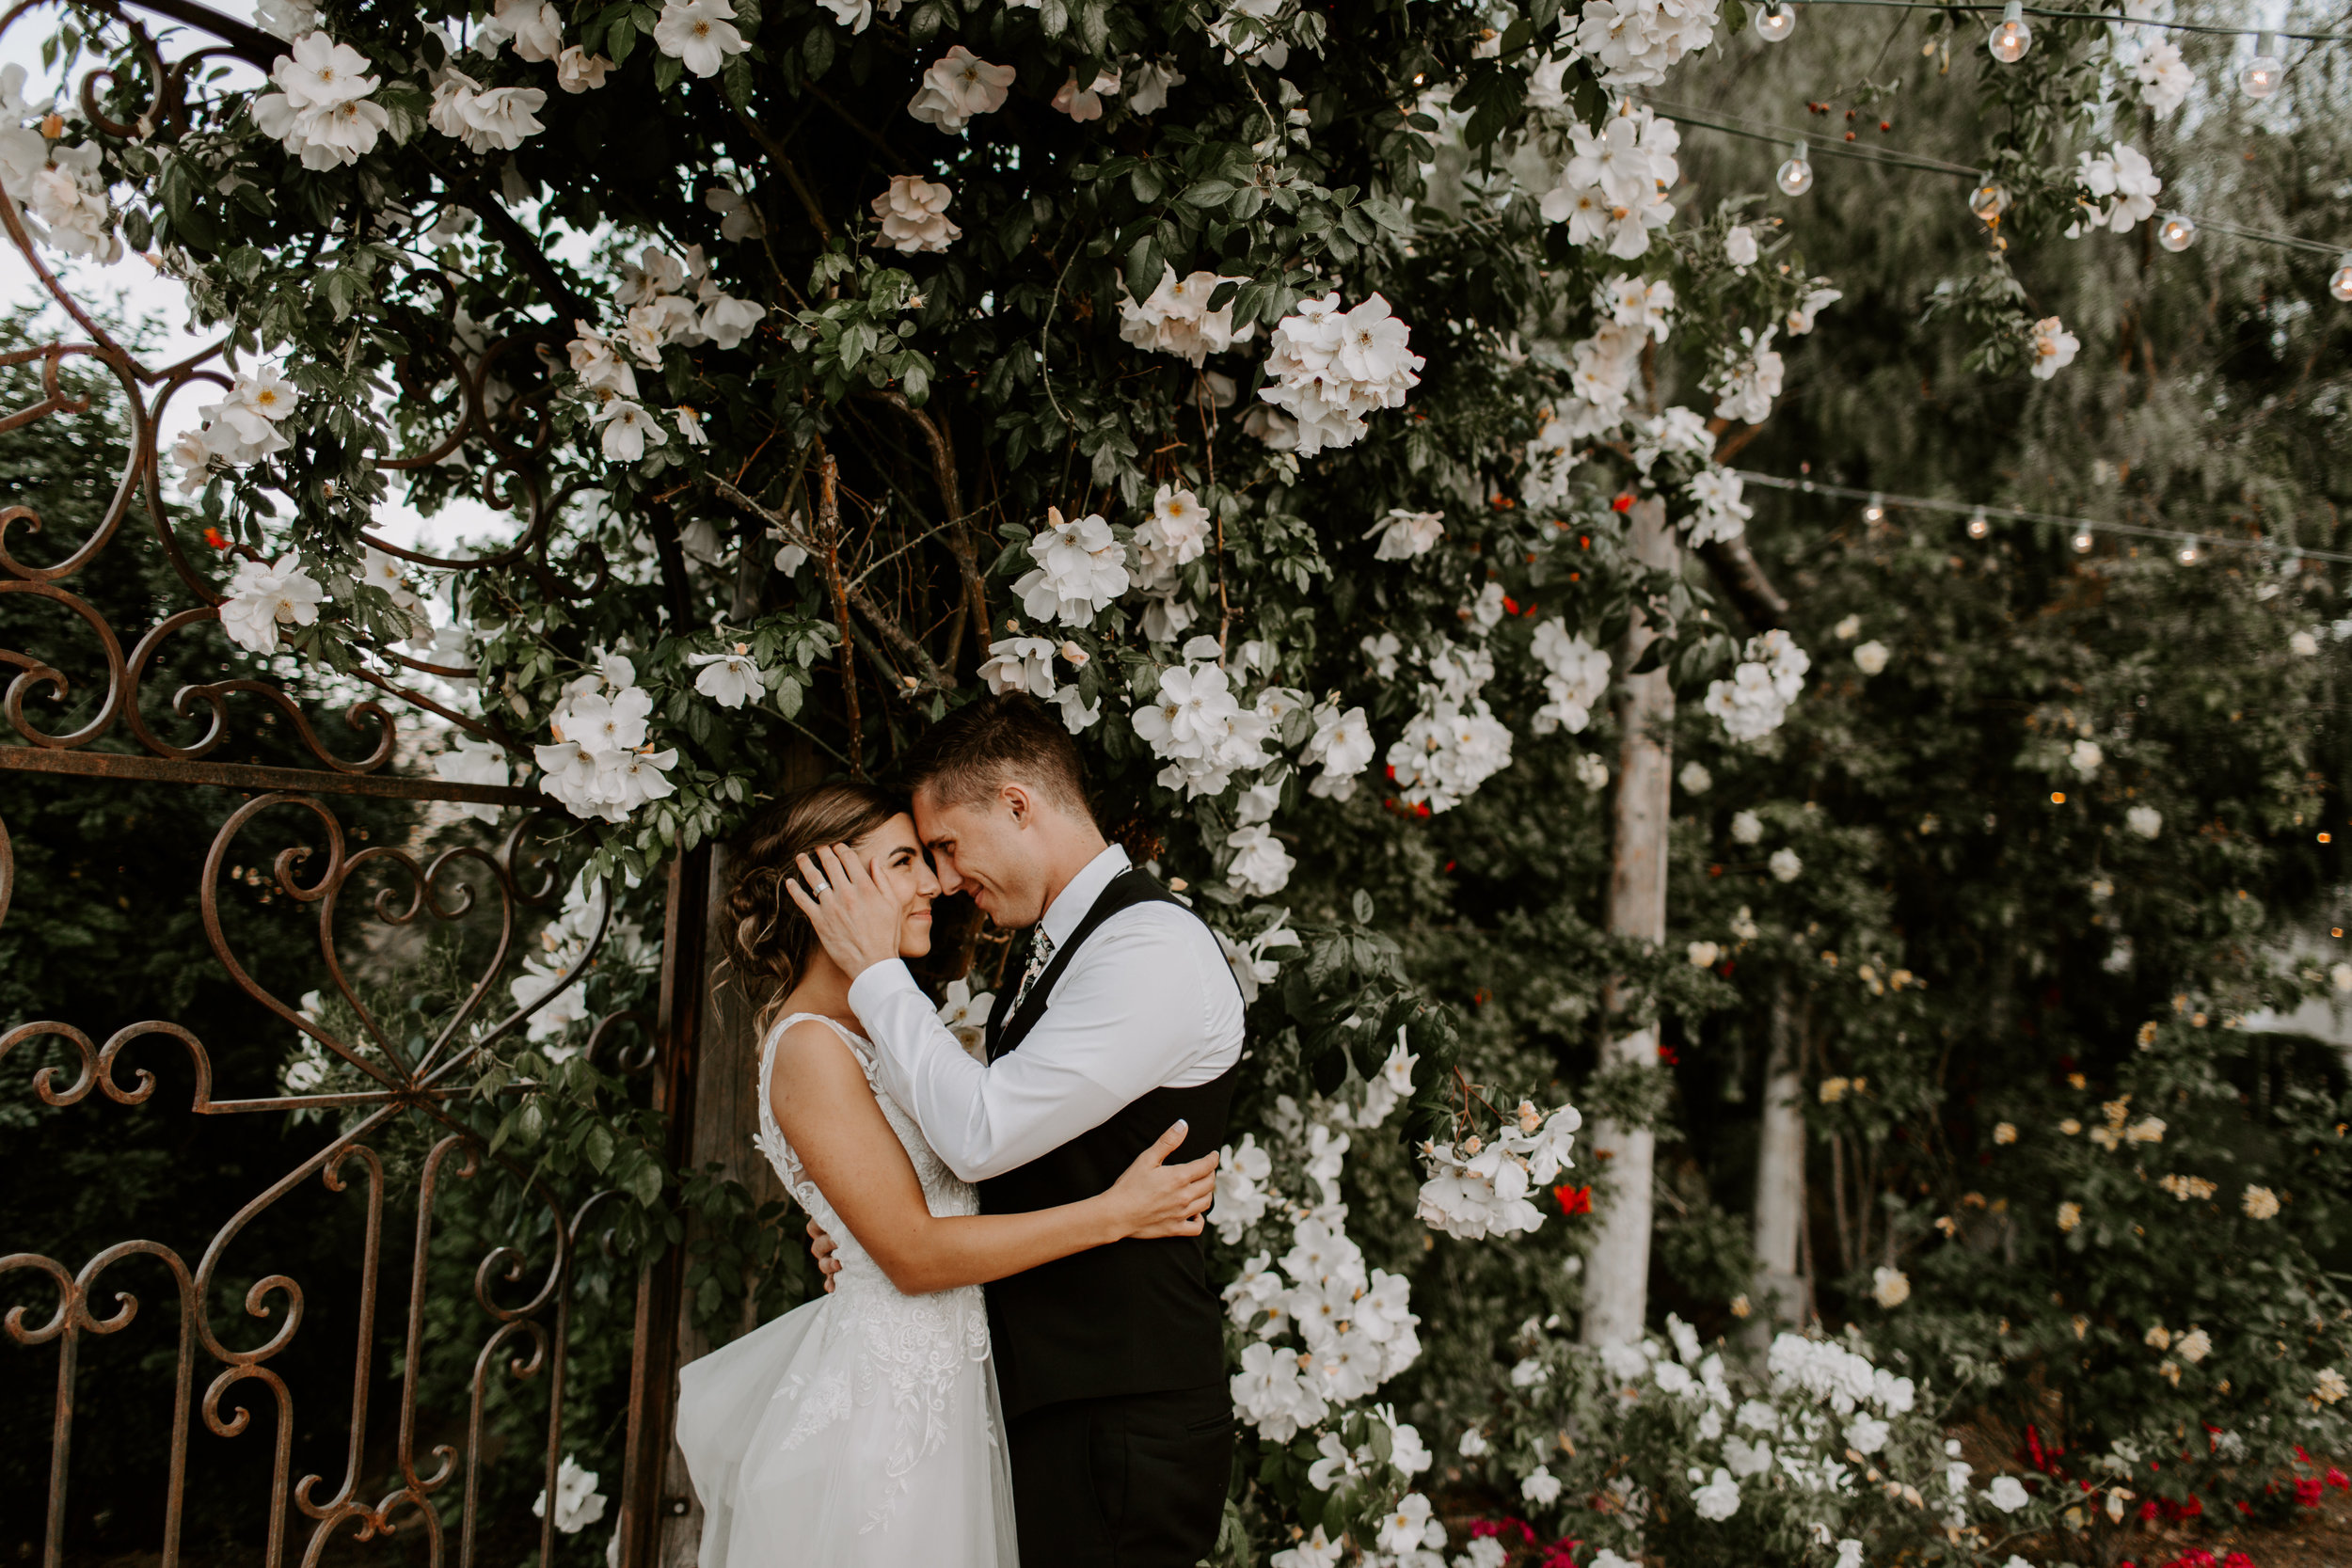 kate+zack_wedding_secludedgardenestate_temecula_madisonrylee_0846.jpg